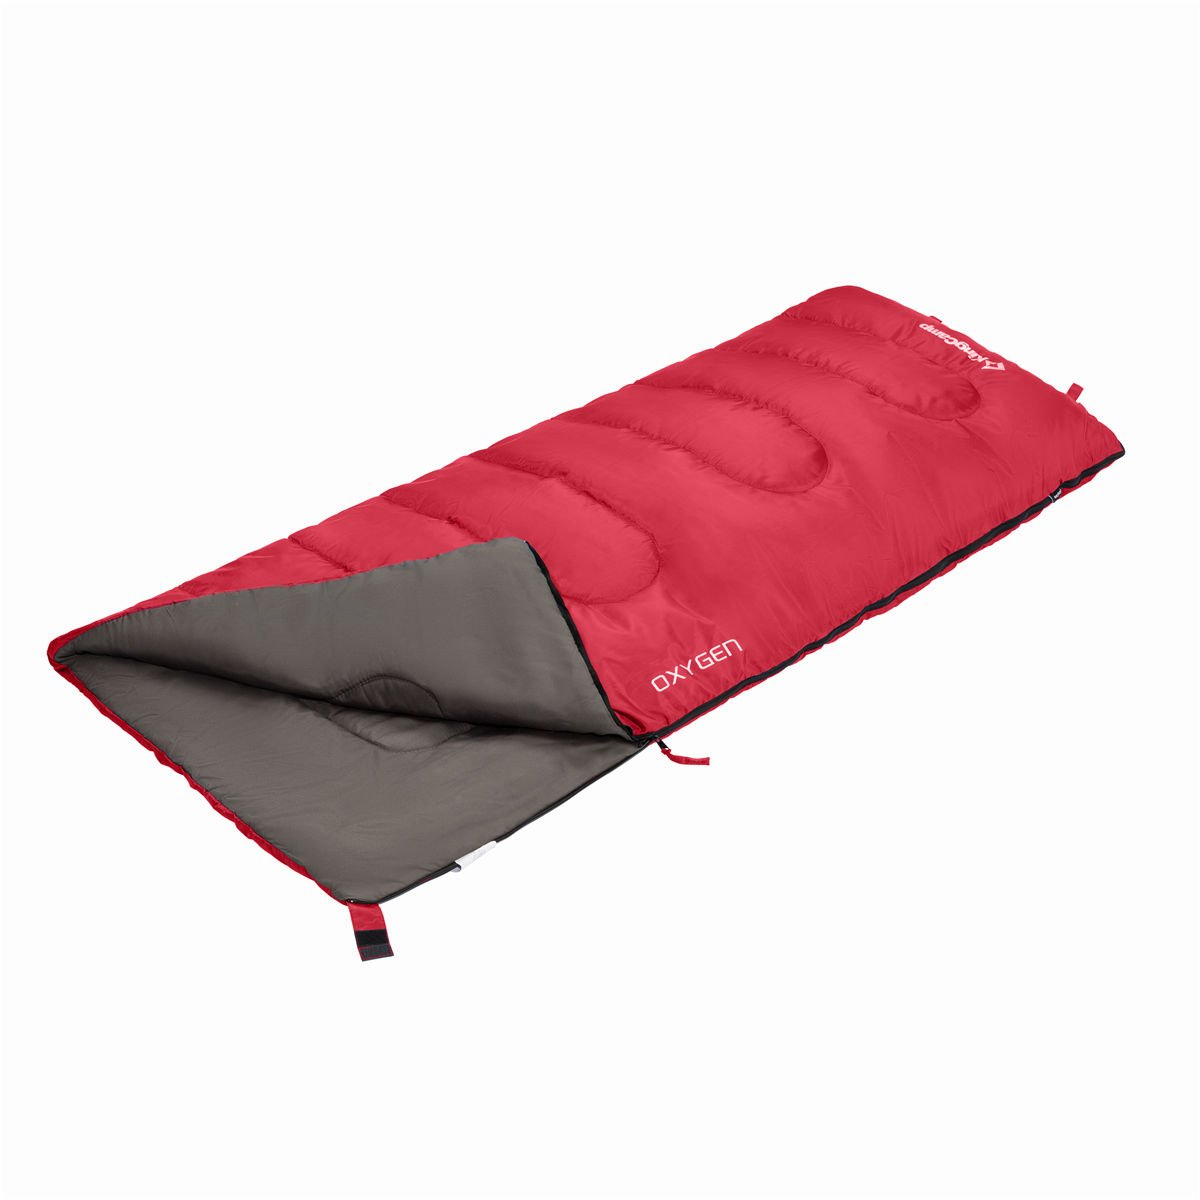 Oxygen 12 C / 53 F Lightweight Sleeping Bag Camping Backpacking 7429''